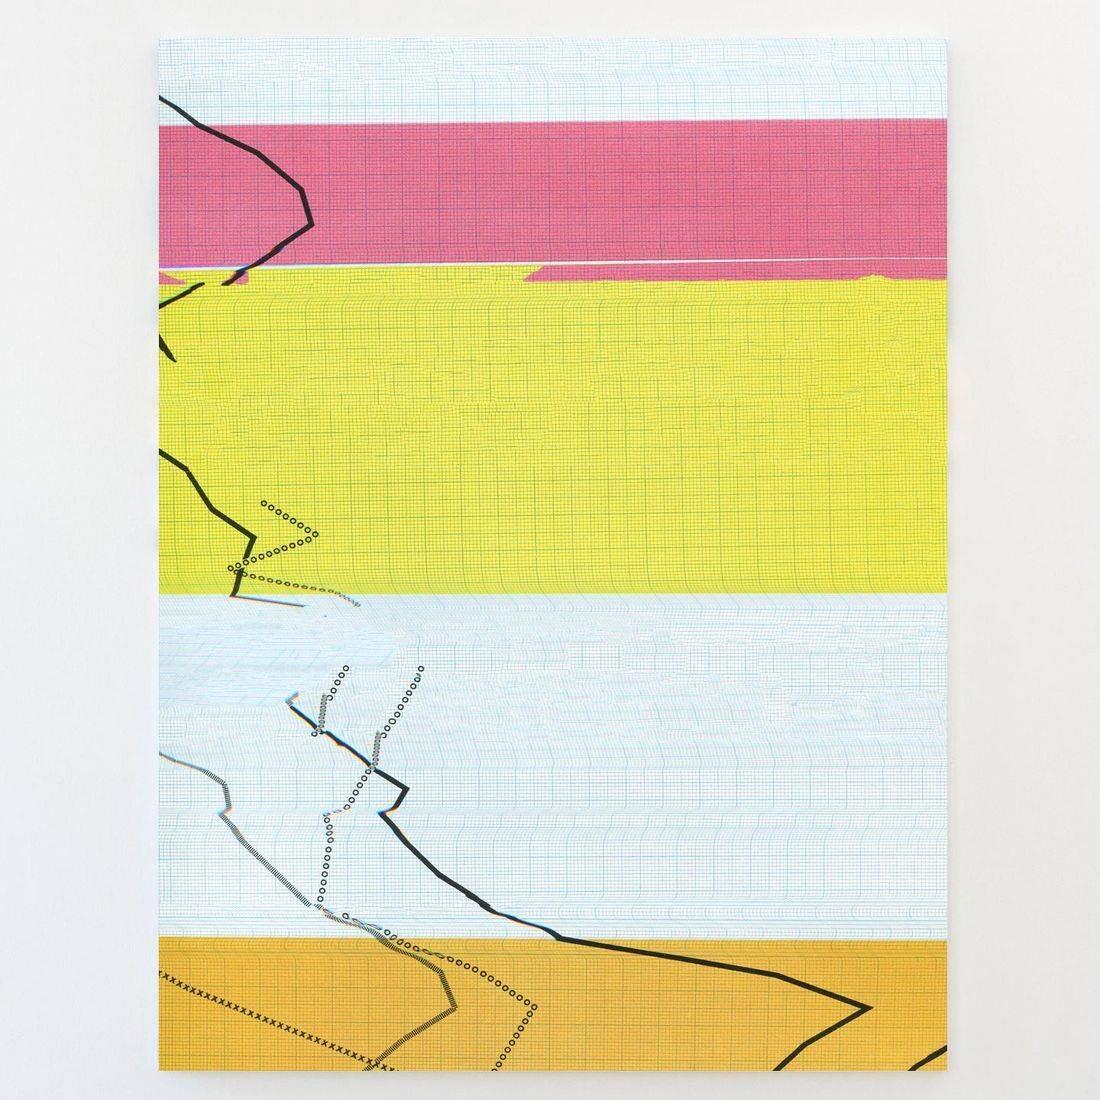 Raphael Brunk RPR ART